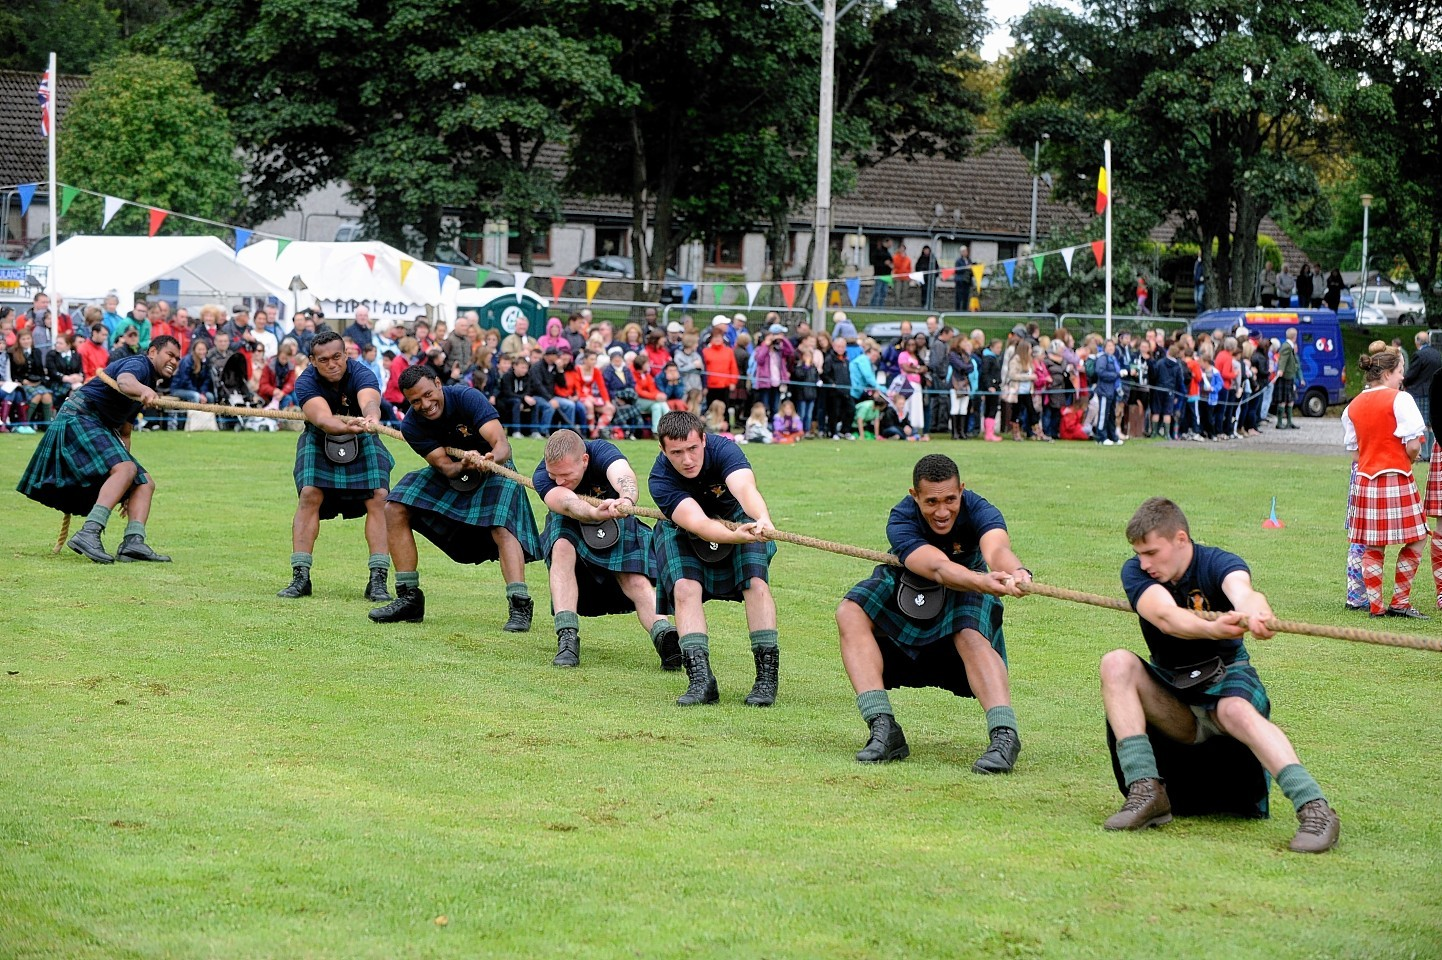 The tug o' war at Ballater Highland Games